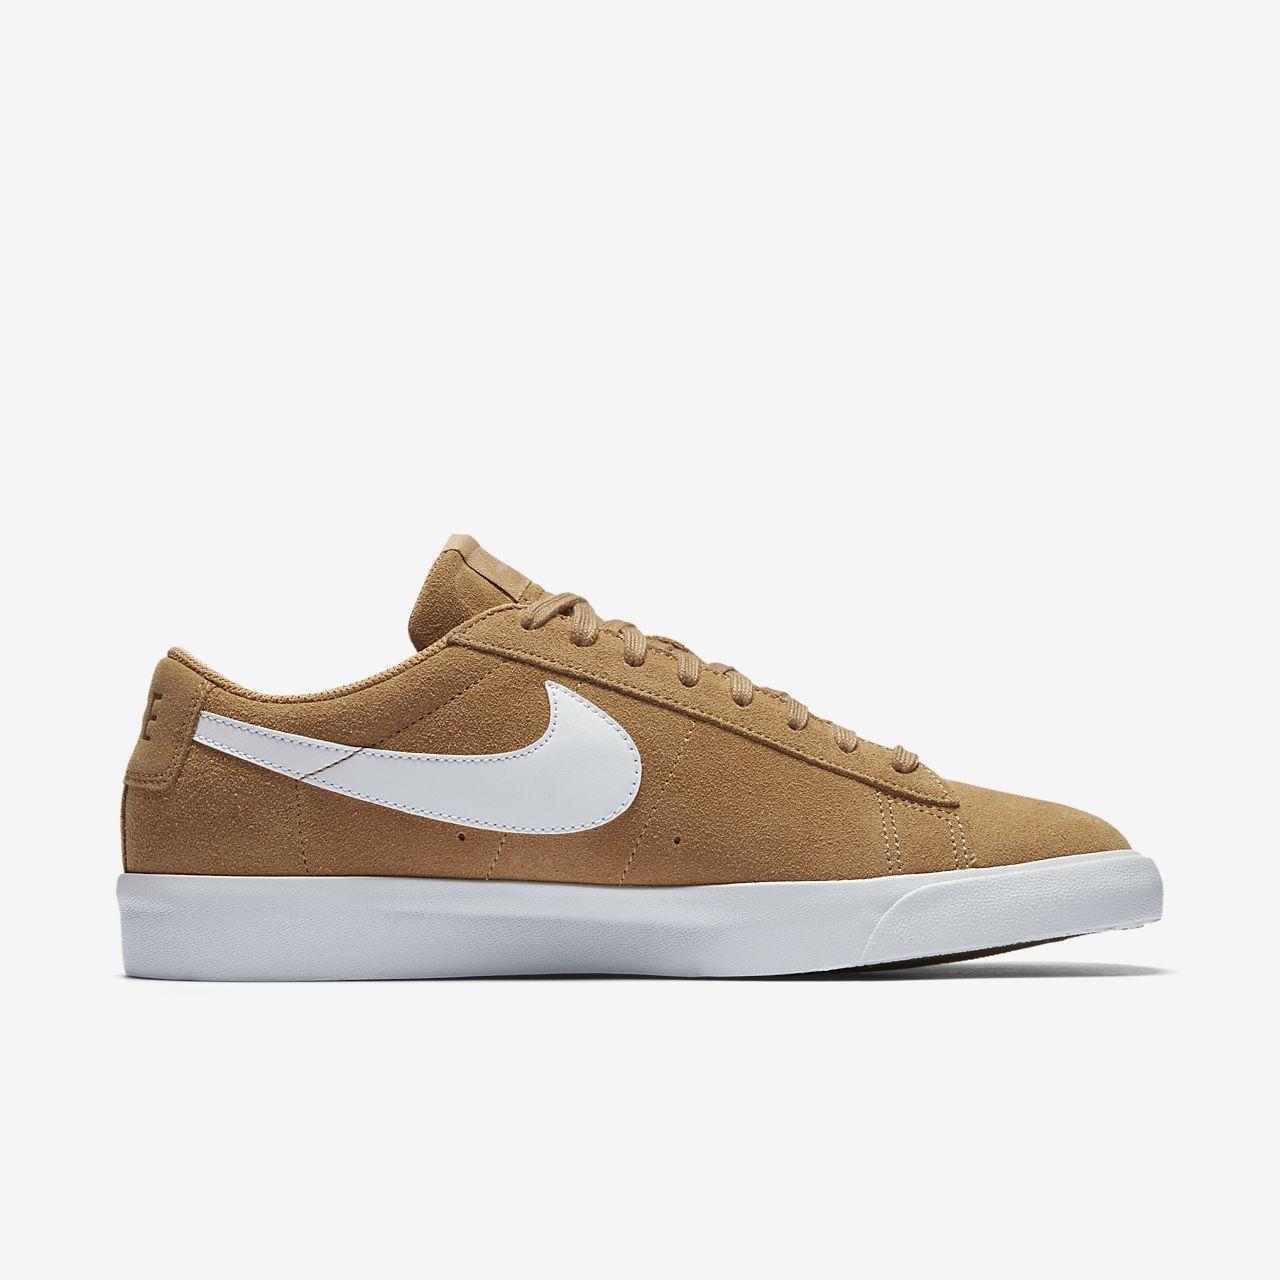 ... Nike Blazer Low Men's Shoe